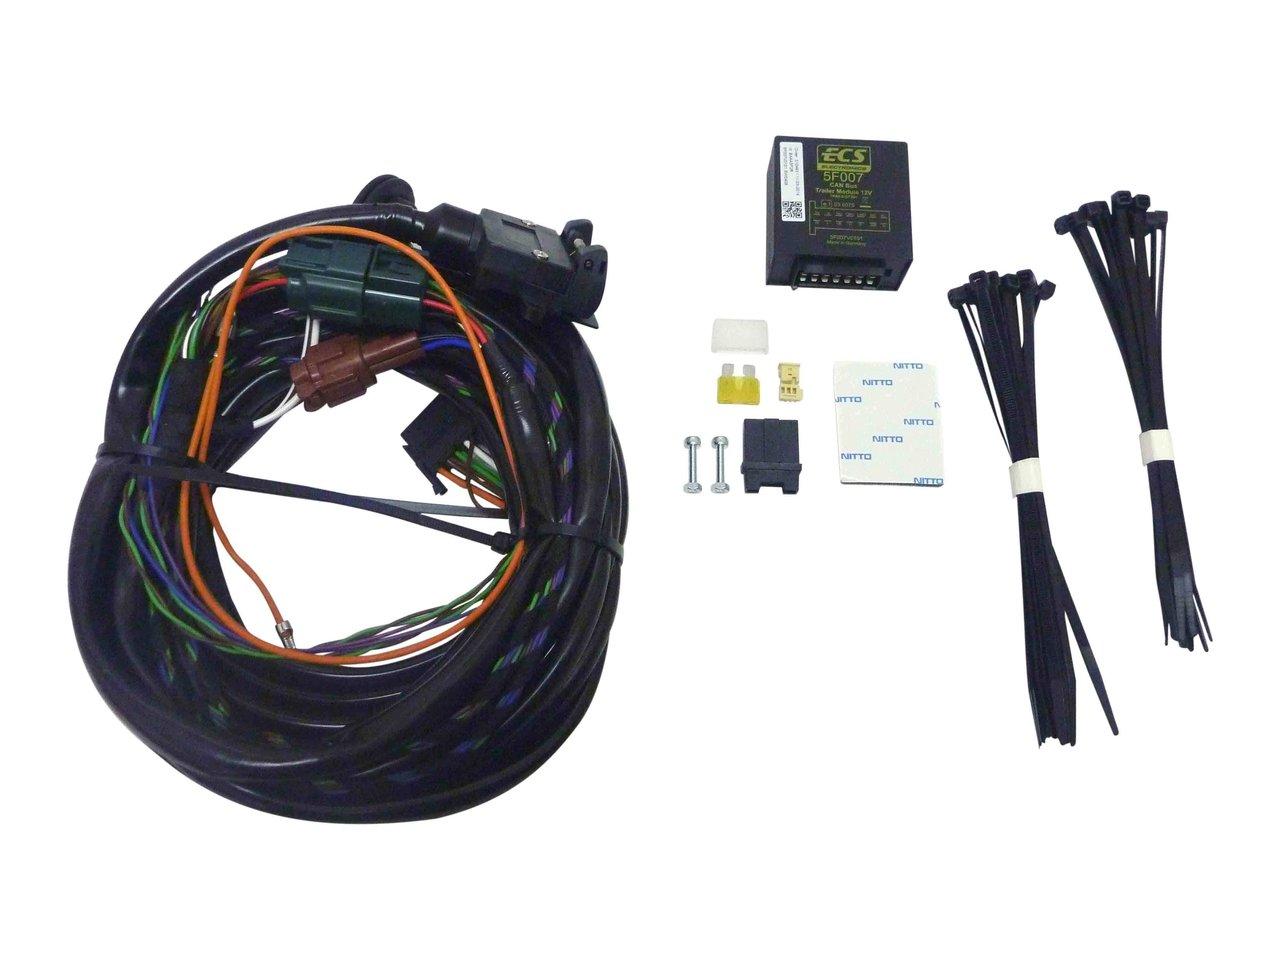 milford towbar wiring harness volkswagon vw amarok 4x4 cabchassis rh allfourx4 com au tow bar wiring harness ford territory tow bar wiring harness diagram